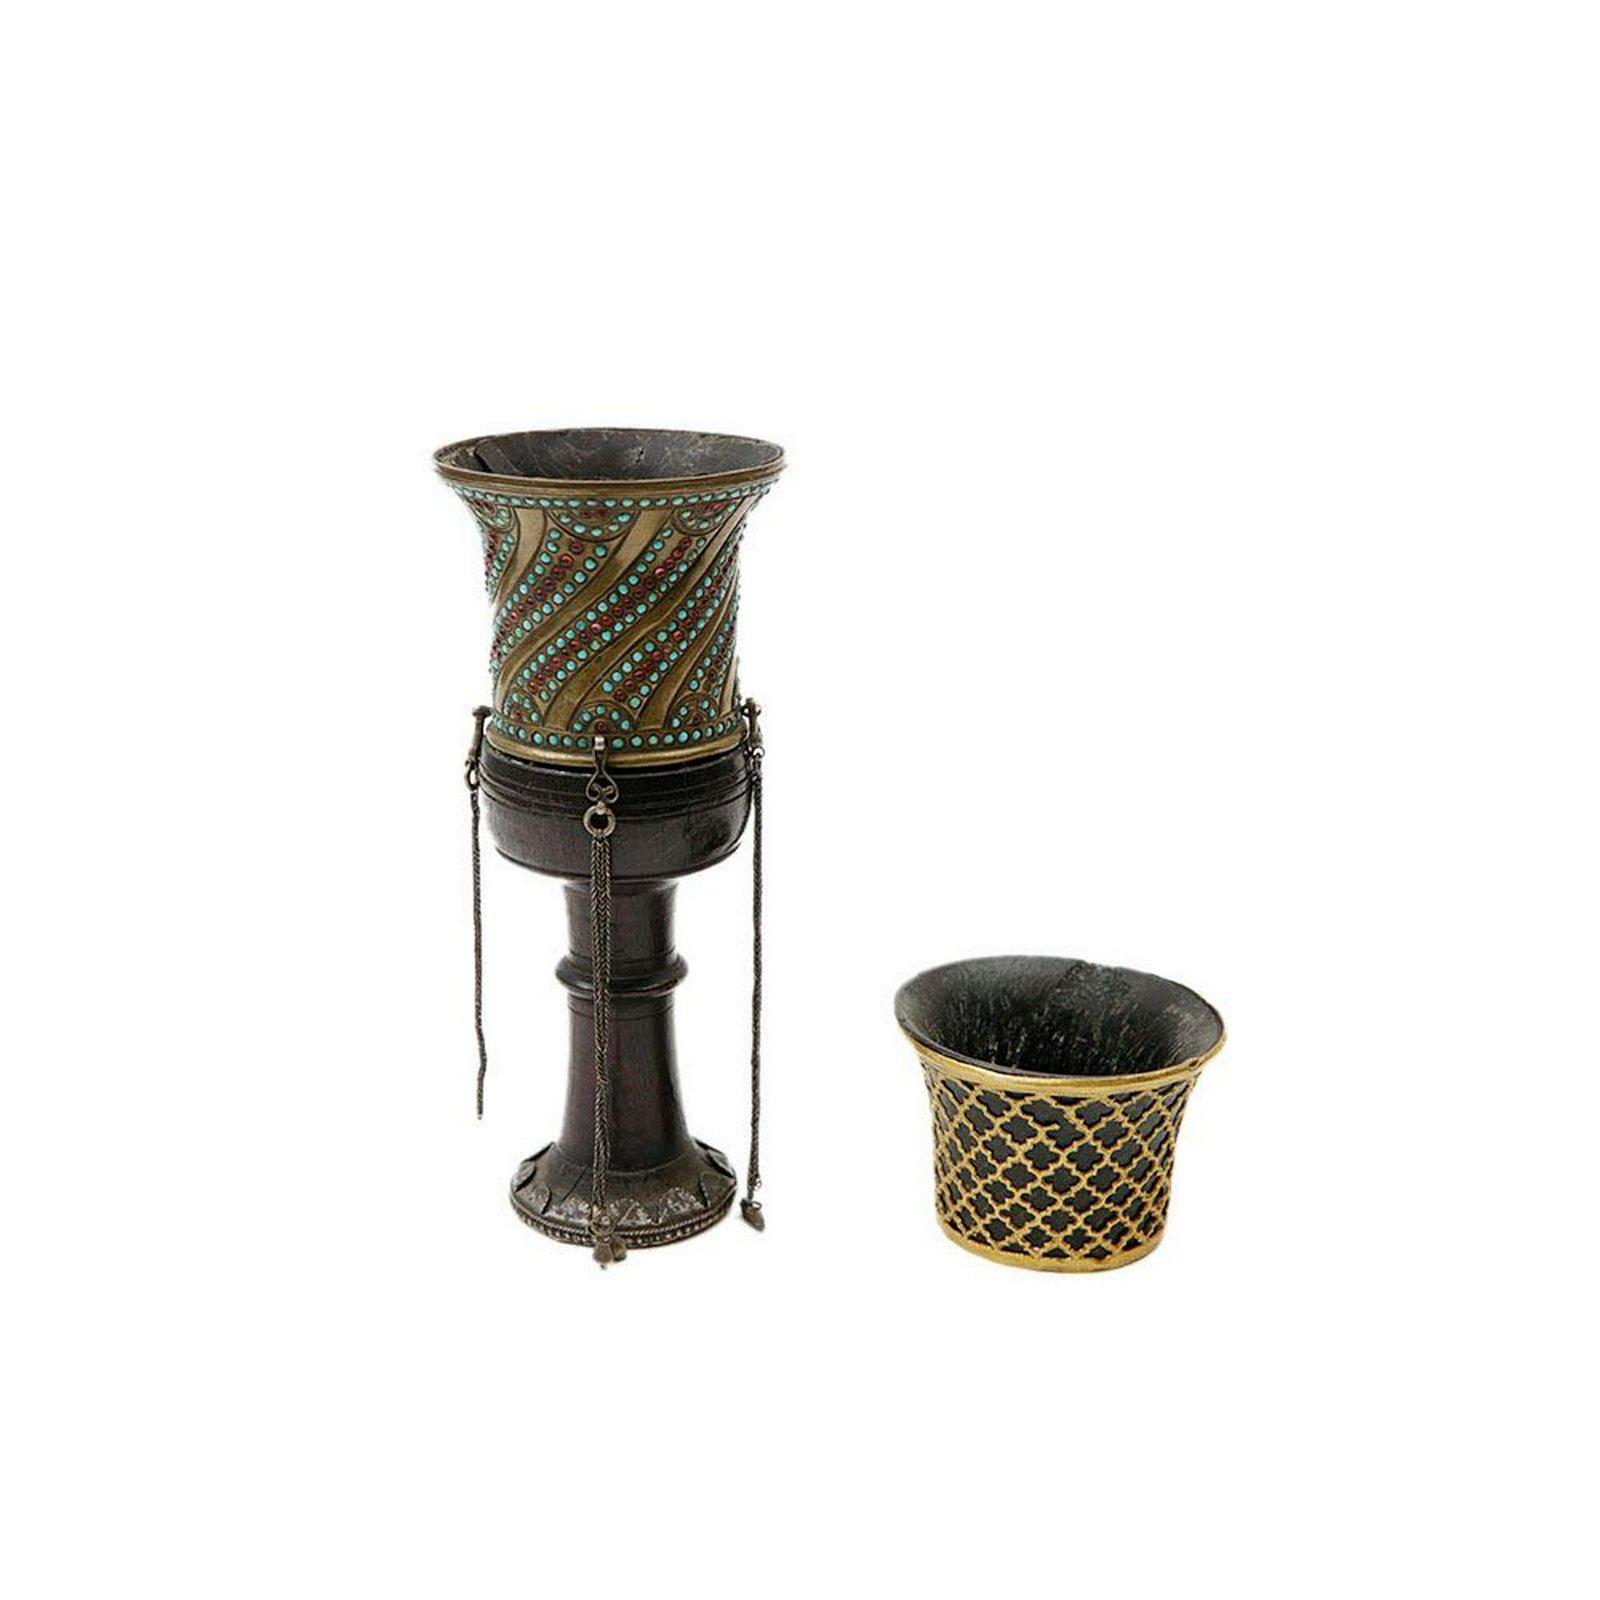 Persian Hookah Head and Gold Hookah cup c.19th century.